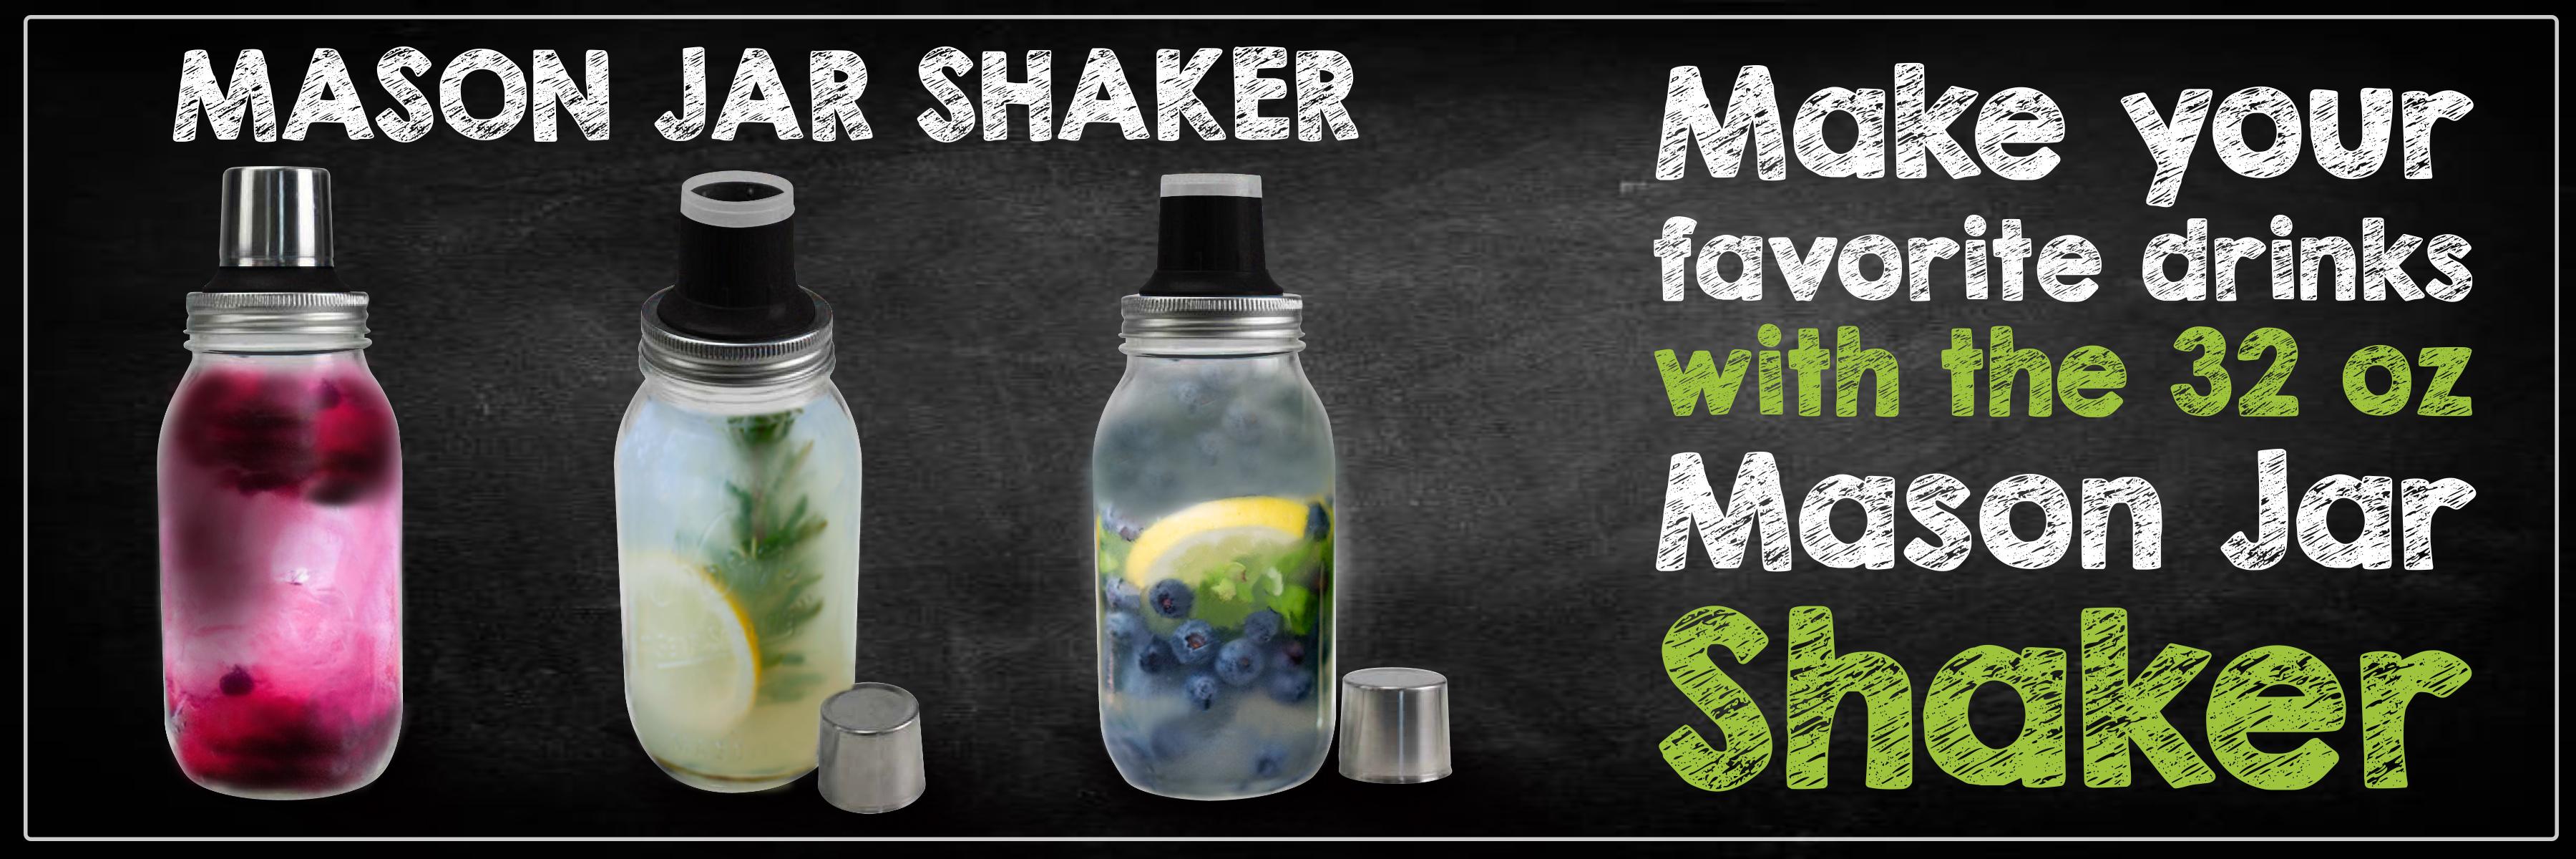 Mason Jar Shakers